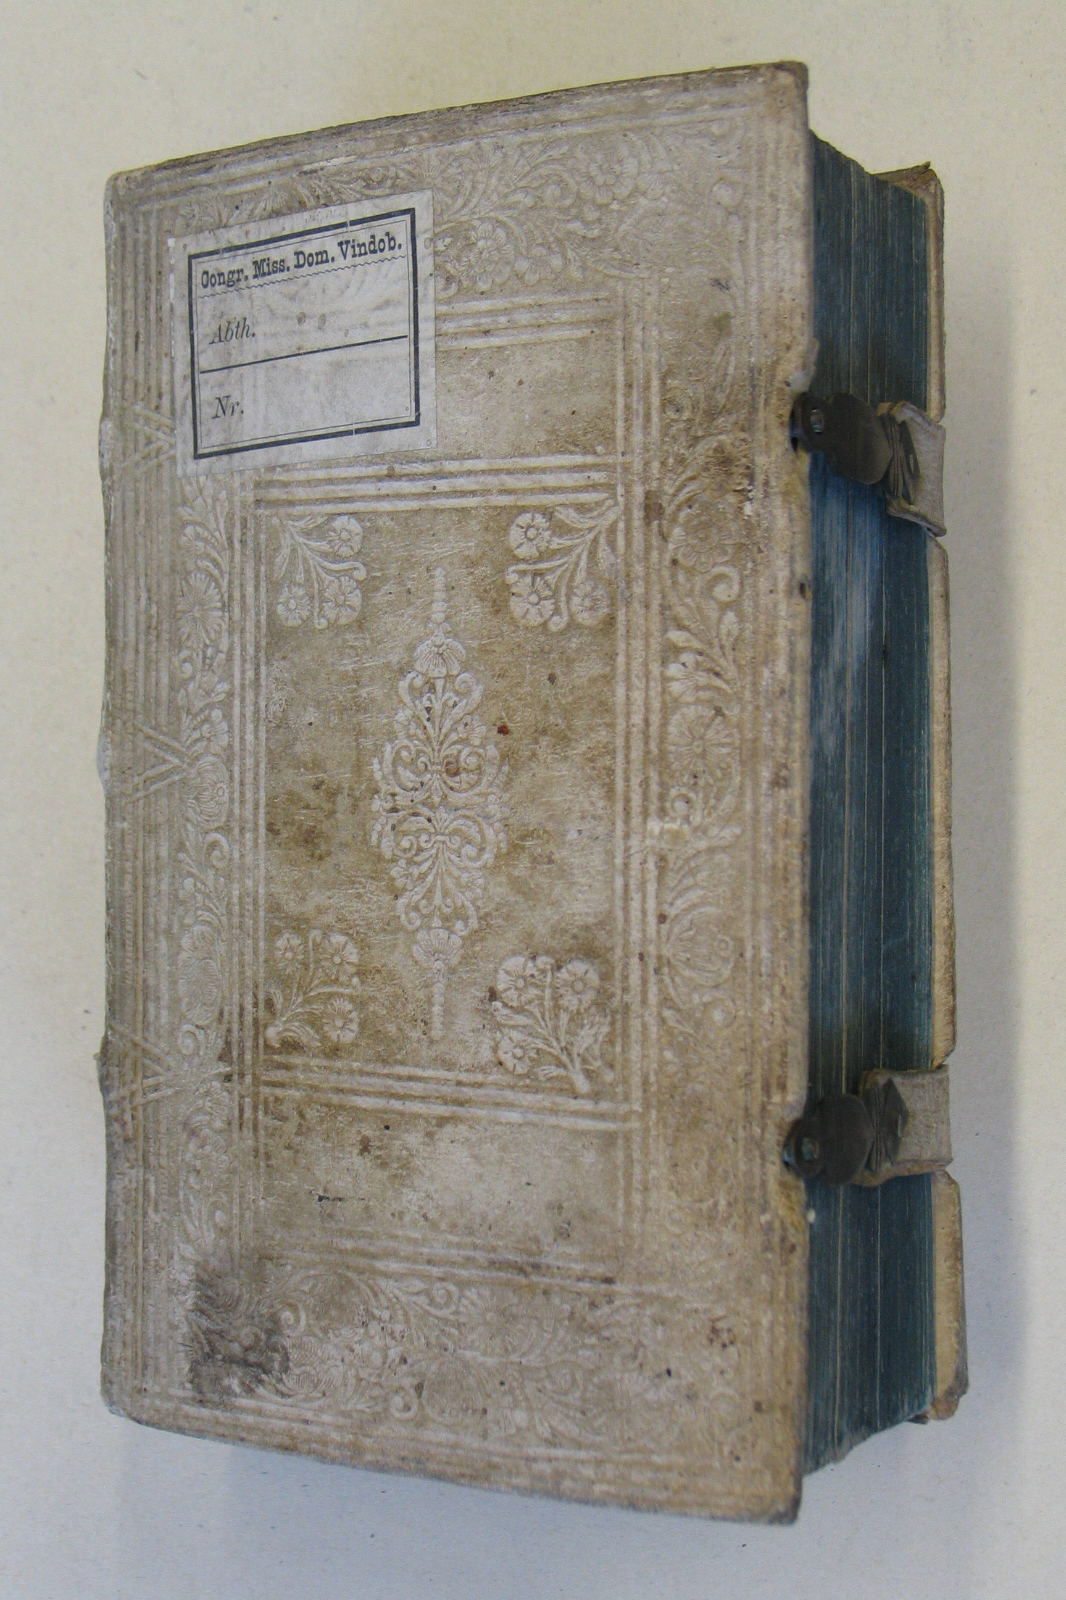 Ova paschalia sacro emblemate inscripta descriptaque. 2: Stengel Georg